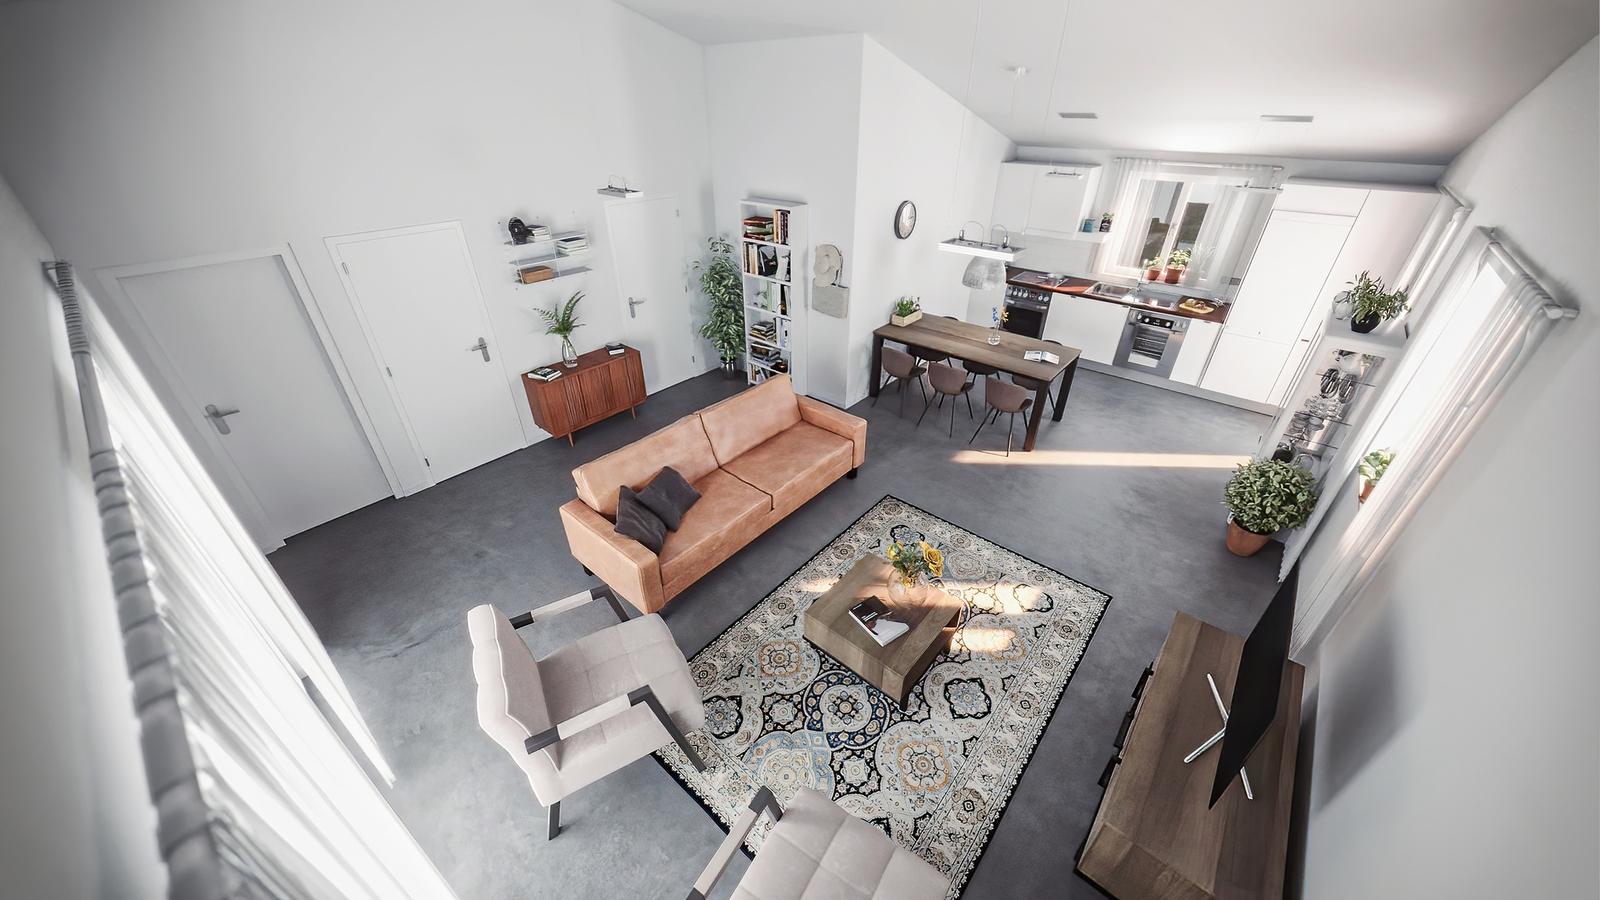 3-room villa accommodating 4/6 people